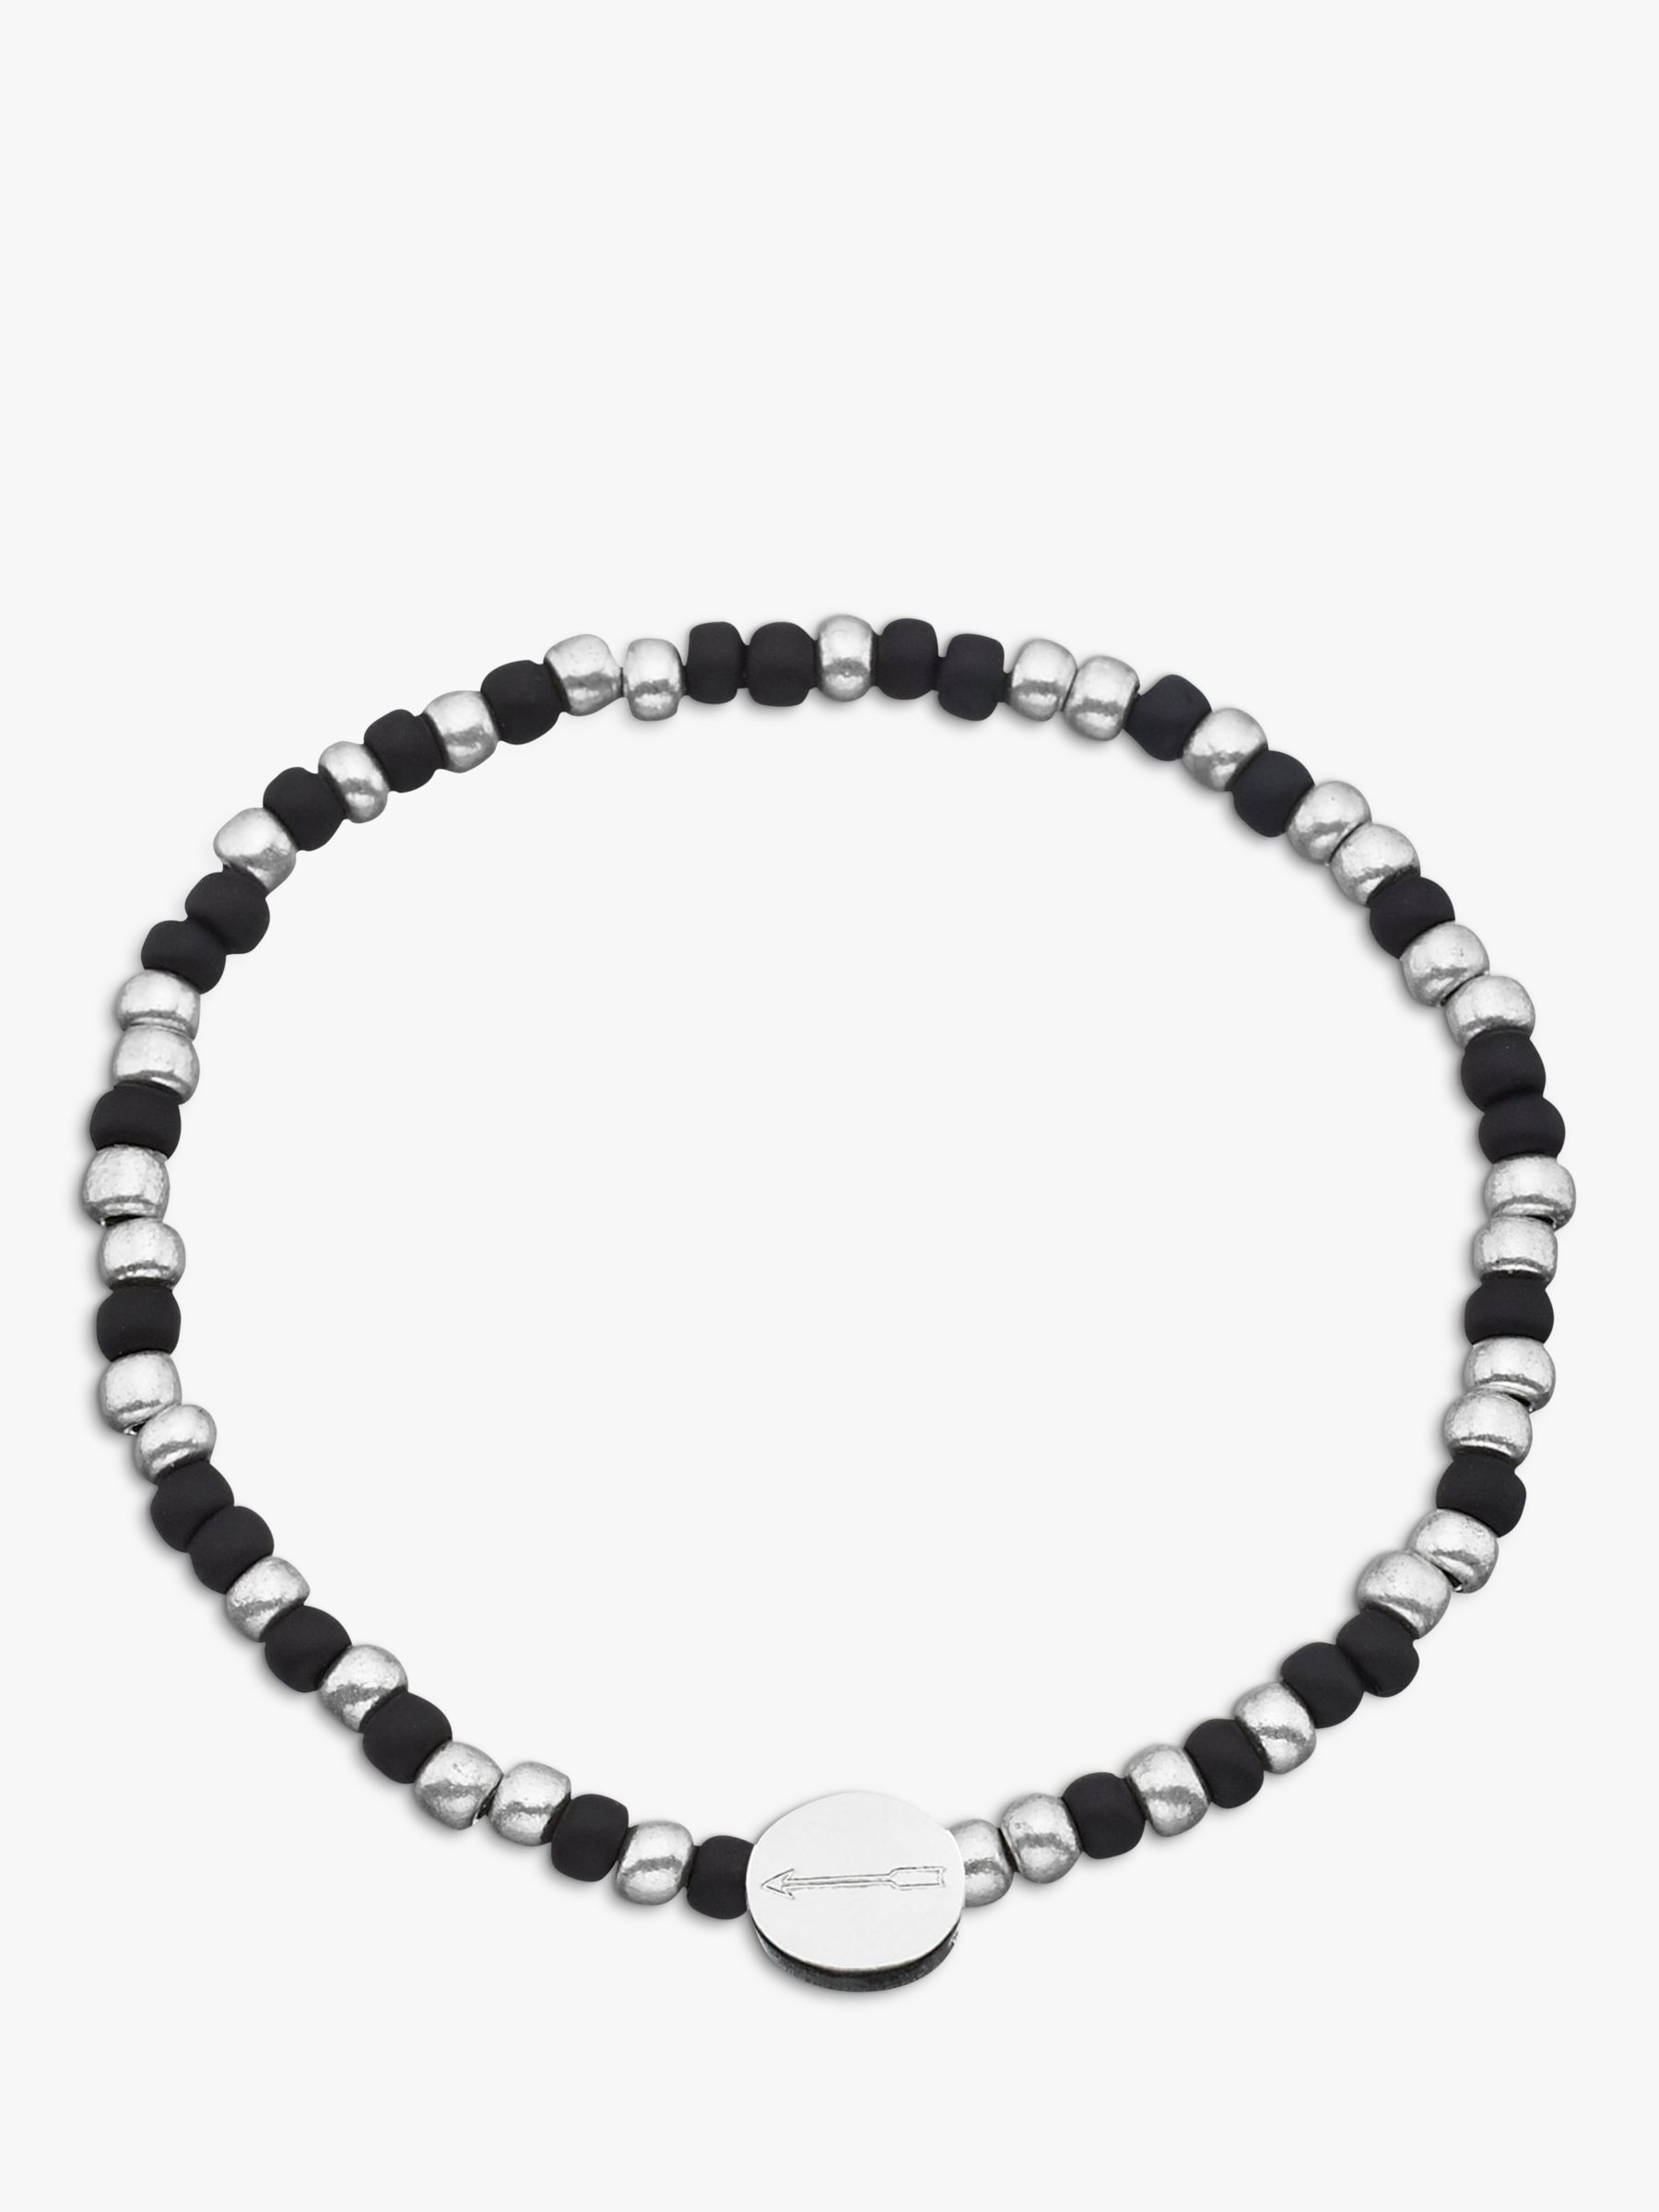 Under The Rose Under the Rose Morse Code 'Love you' Bead Bracelet, Black/Silver